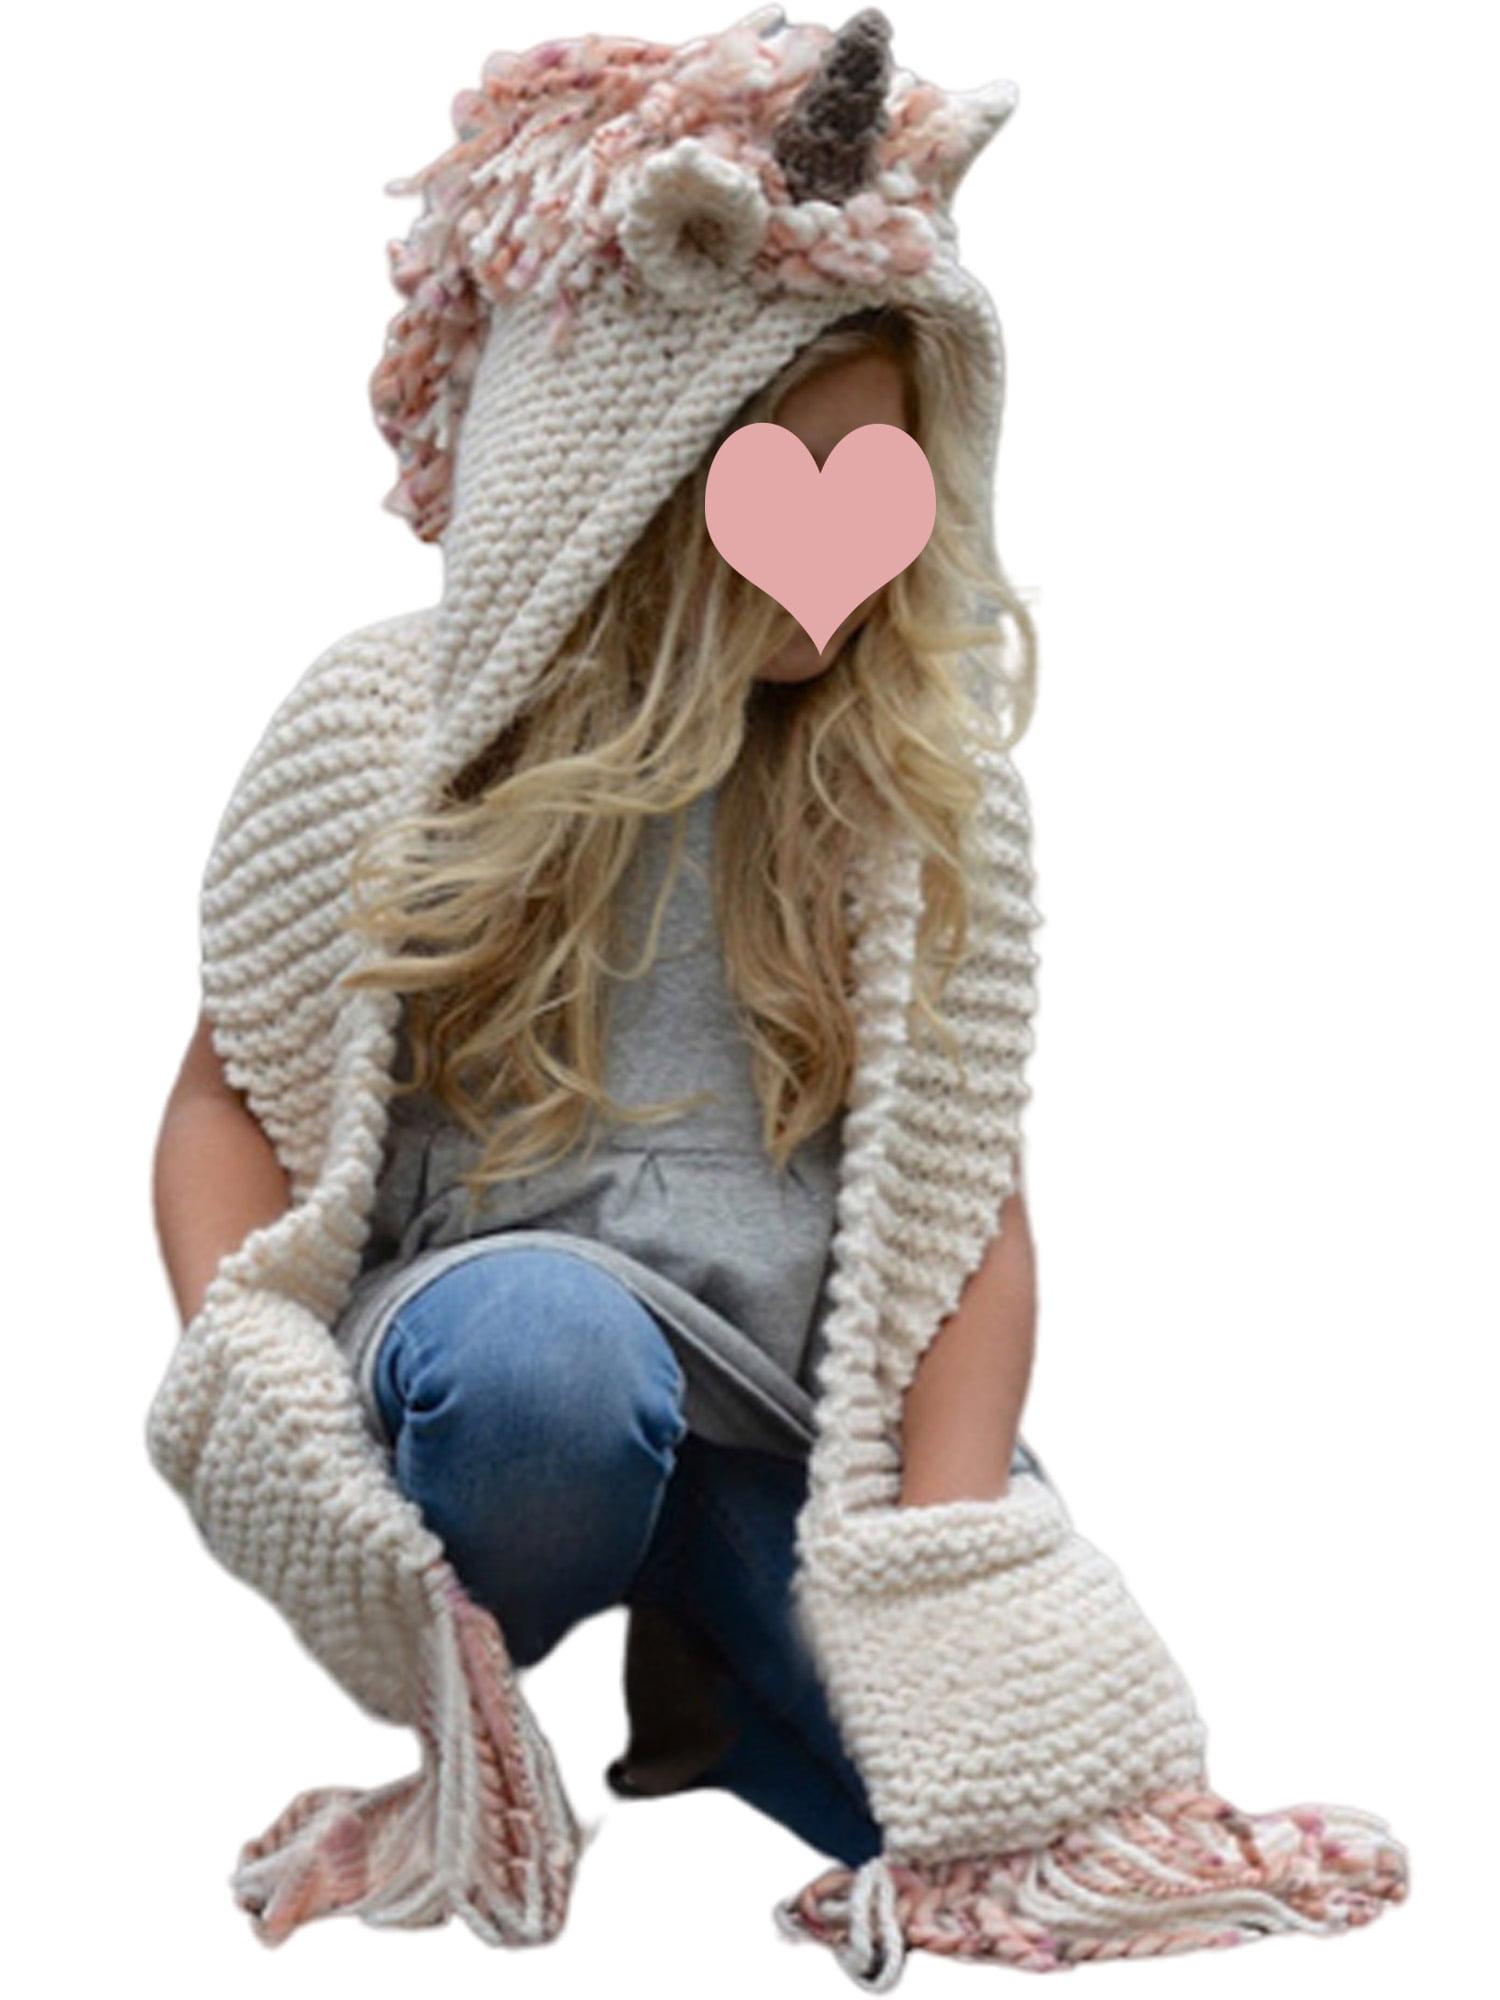 Eyicmarn Girls Unicorn Hooded Scarf Animal Hoodie Winter Cowl Crochet Knitted Beanie Hat Walmart Com Walmart Com